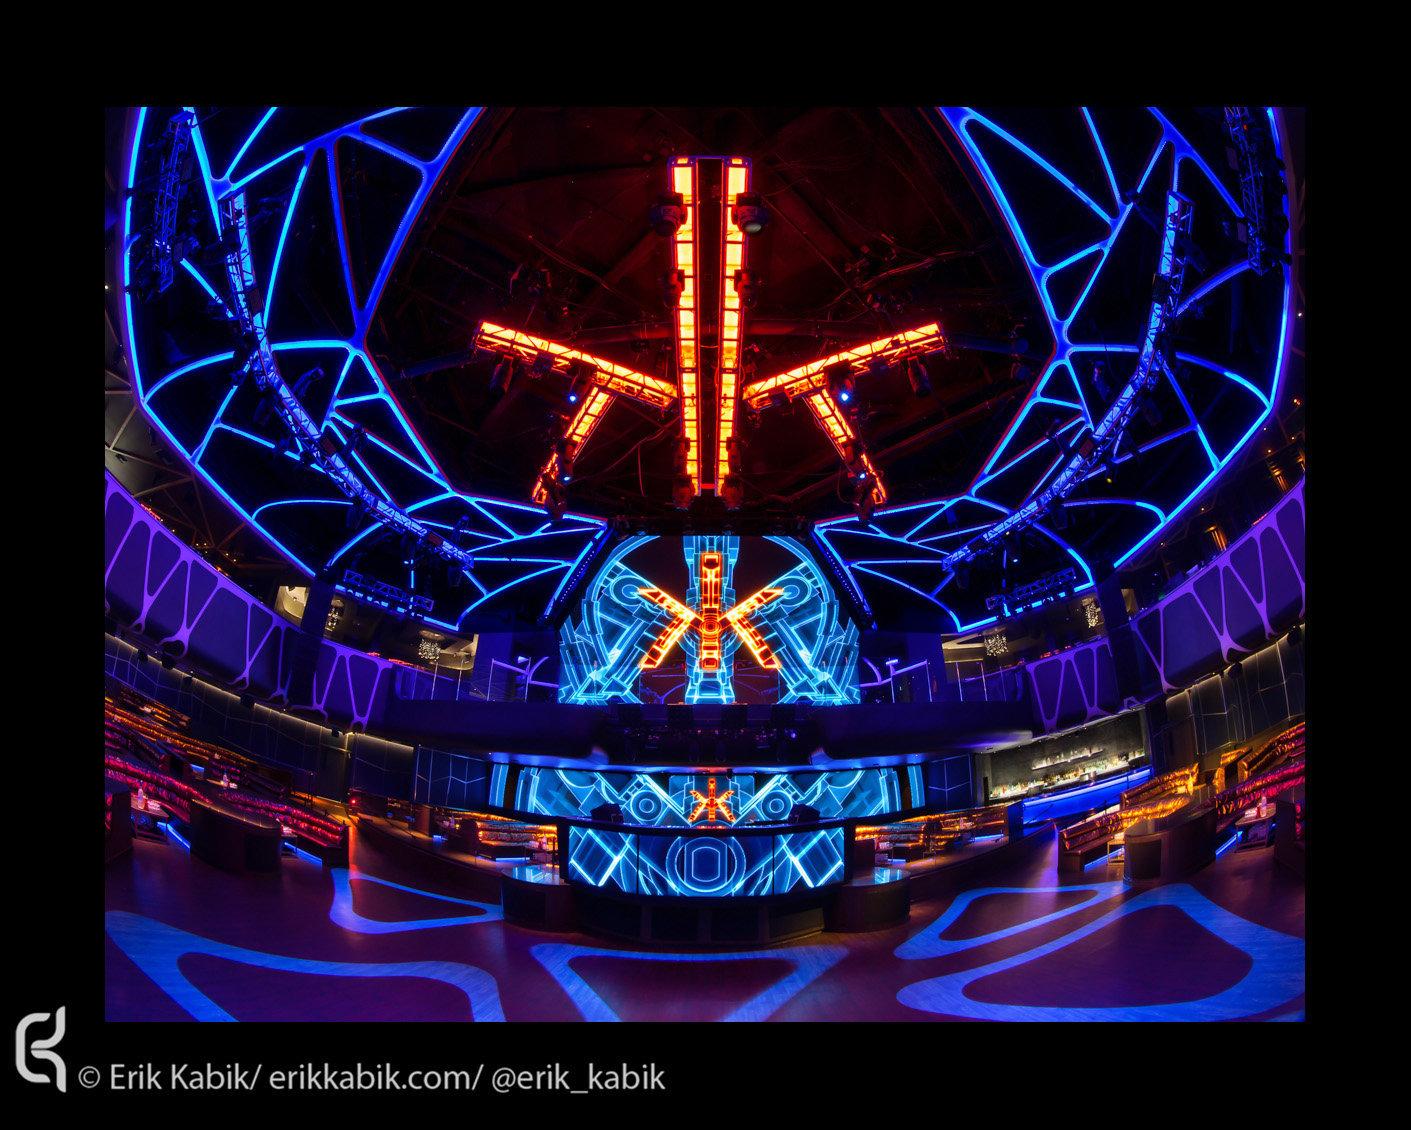 5_31_13_hakkasan_architecture_kabik-19.jpg